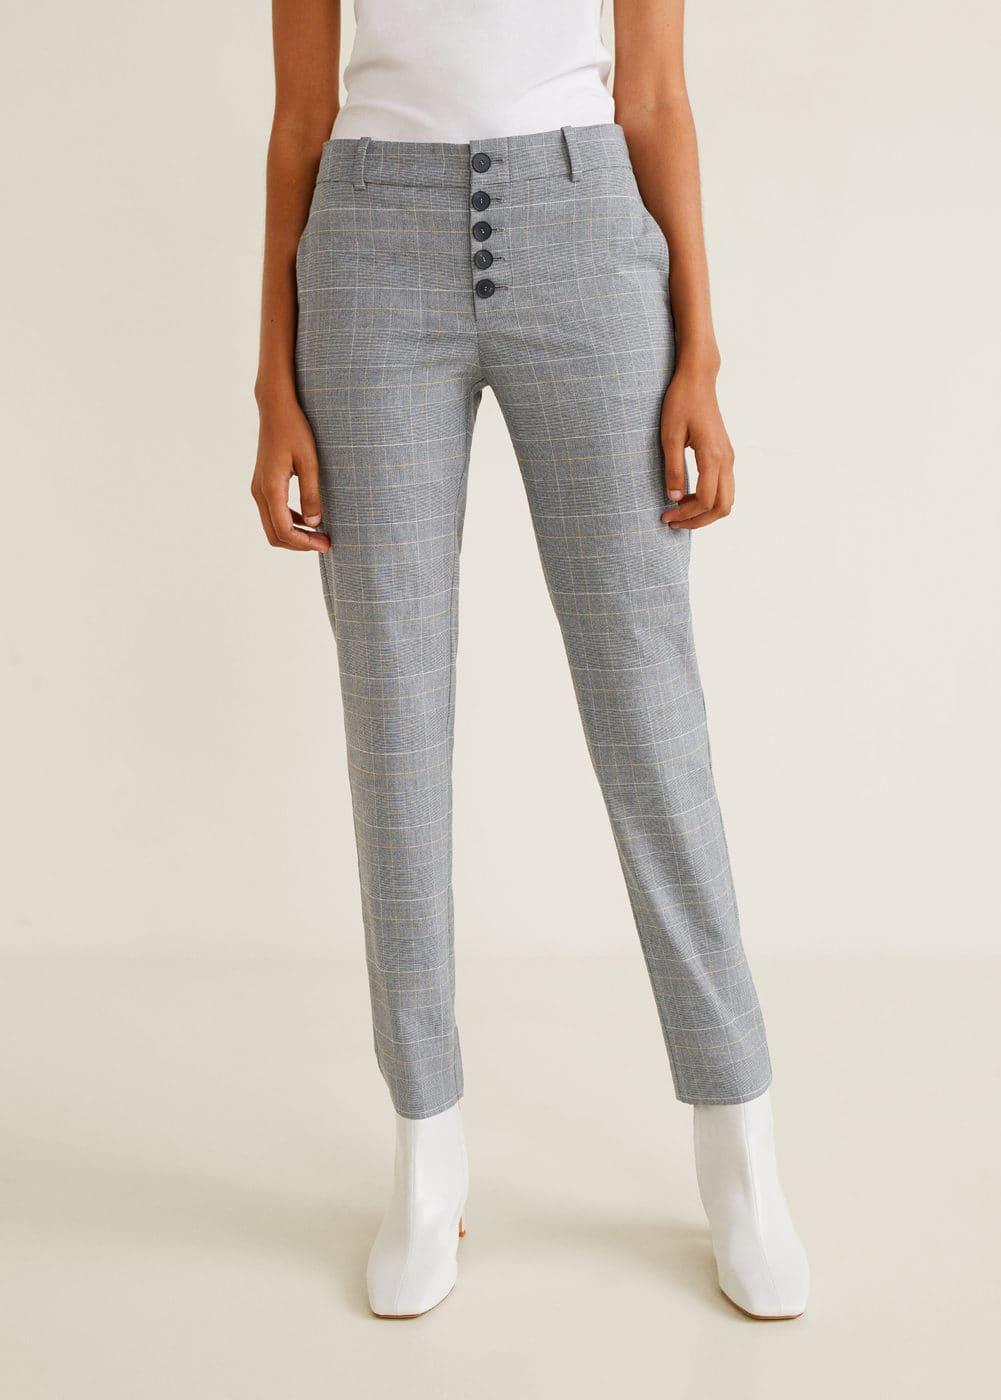 Mango - Buttons cotton trousers - 1